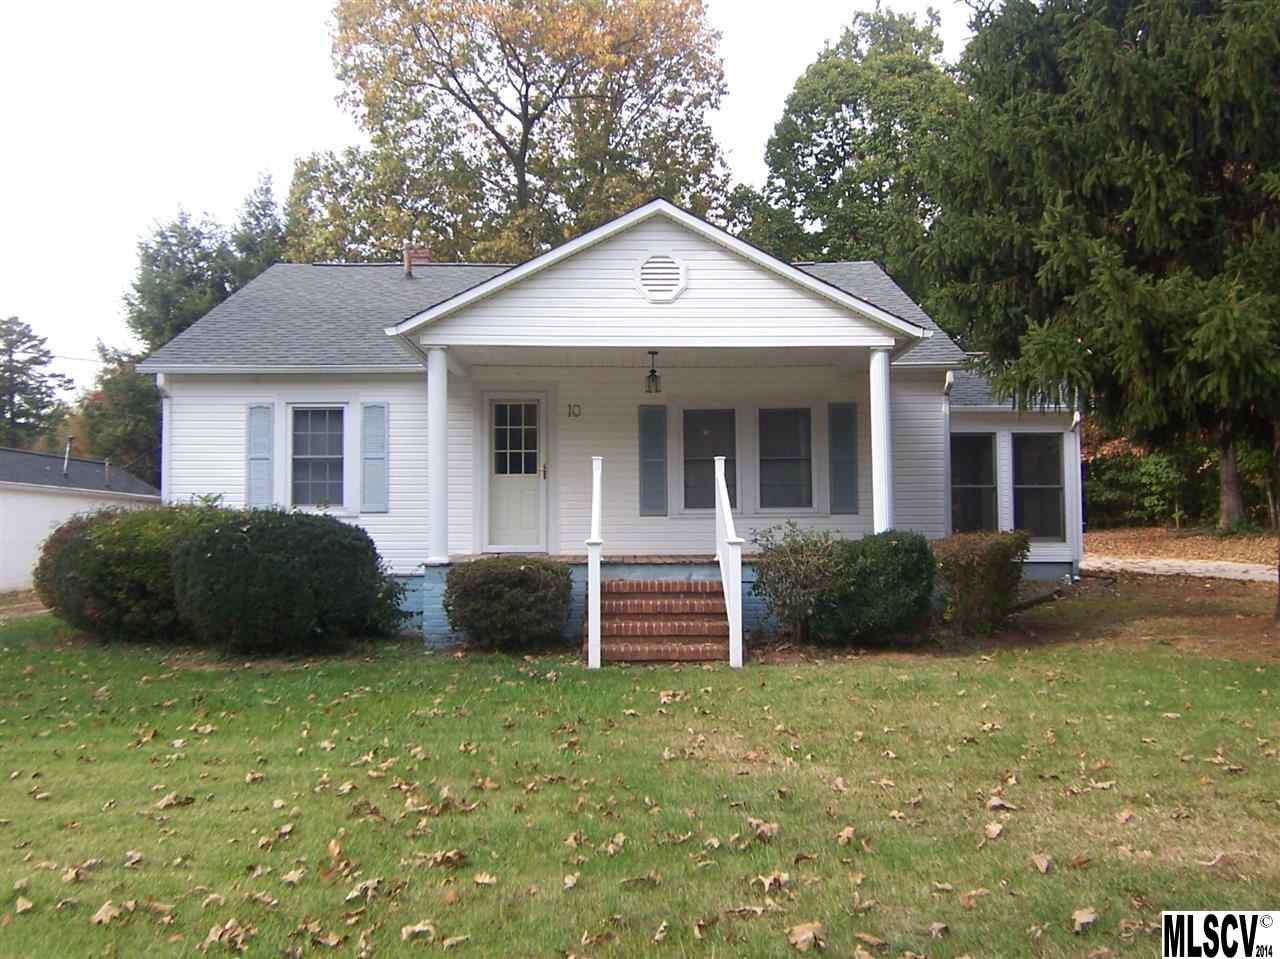 Real Estate for Sale, ListingId: 30515415, Granite Falls,NC28630